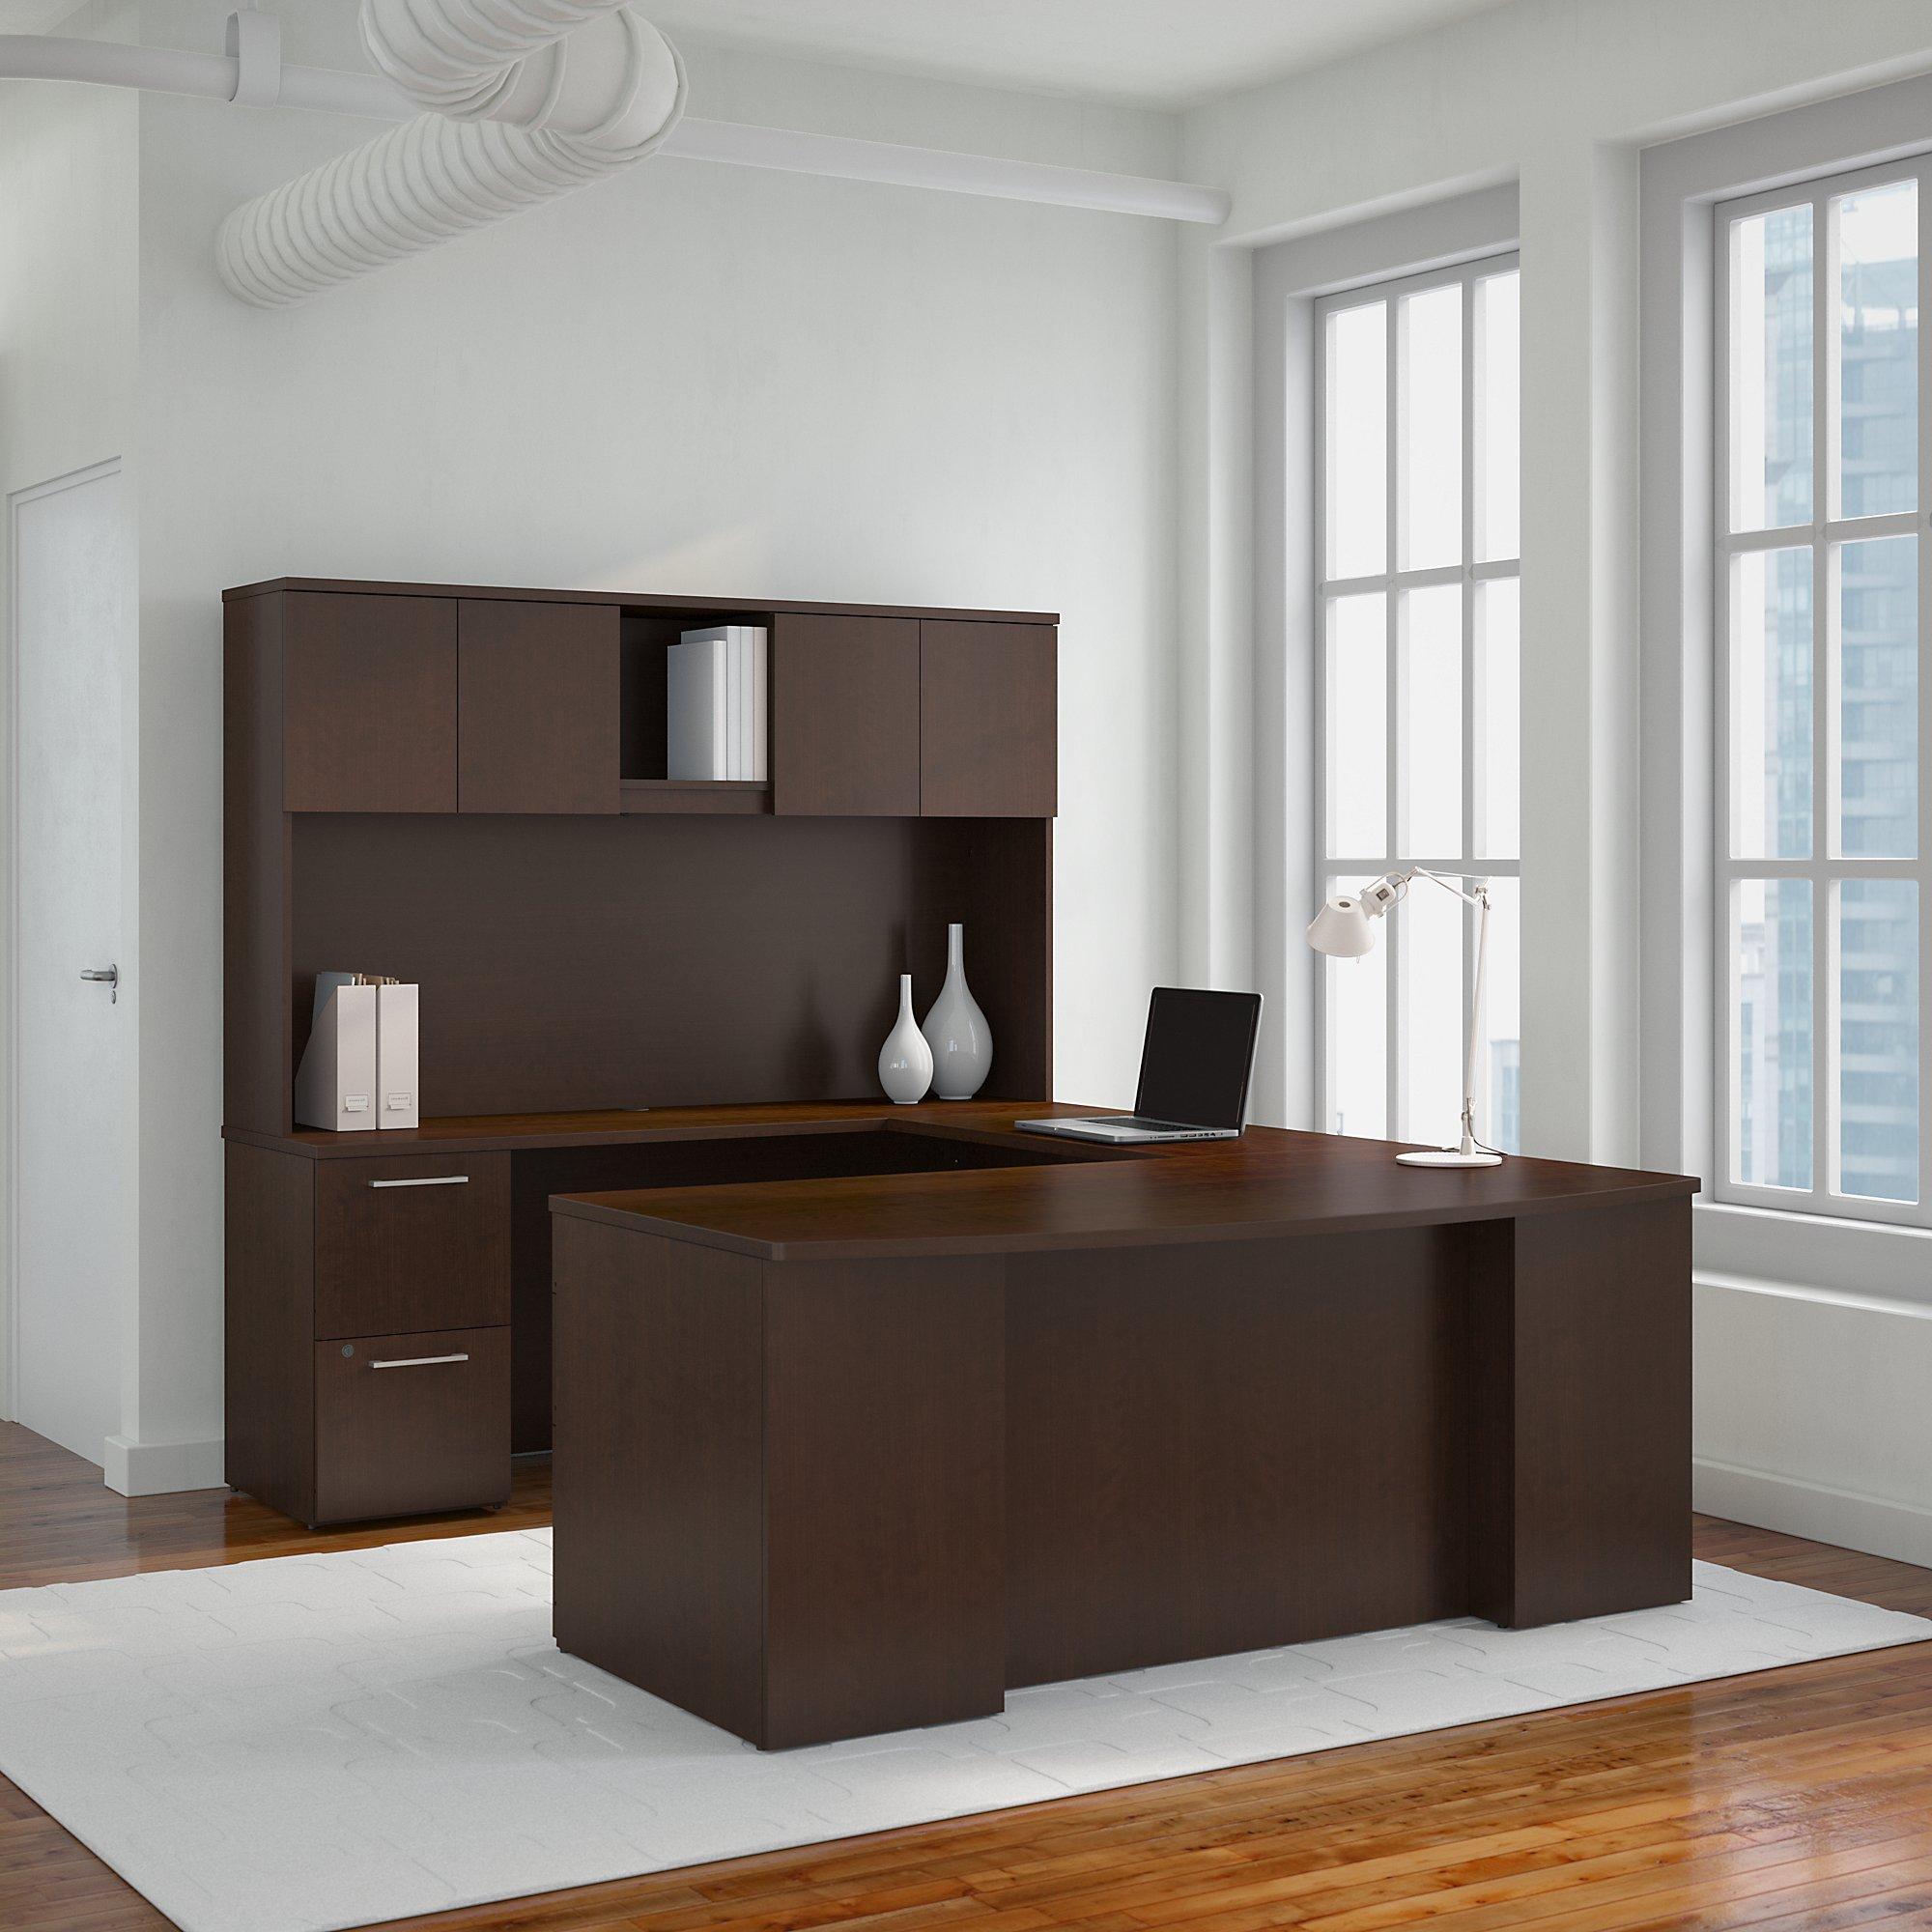 Bush Business Furniture 300S041MR 300 Series 72W x 36D Bow Front U Shaped Desk with Hutch, 2 Pedestals and 42W Bridge, Mocha Cherry